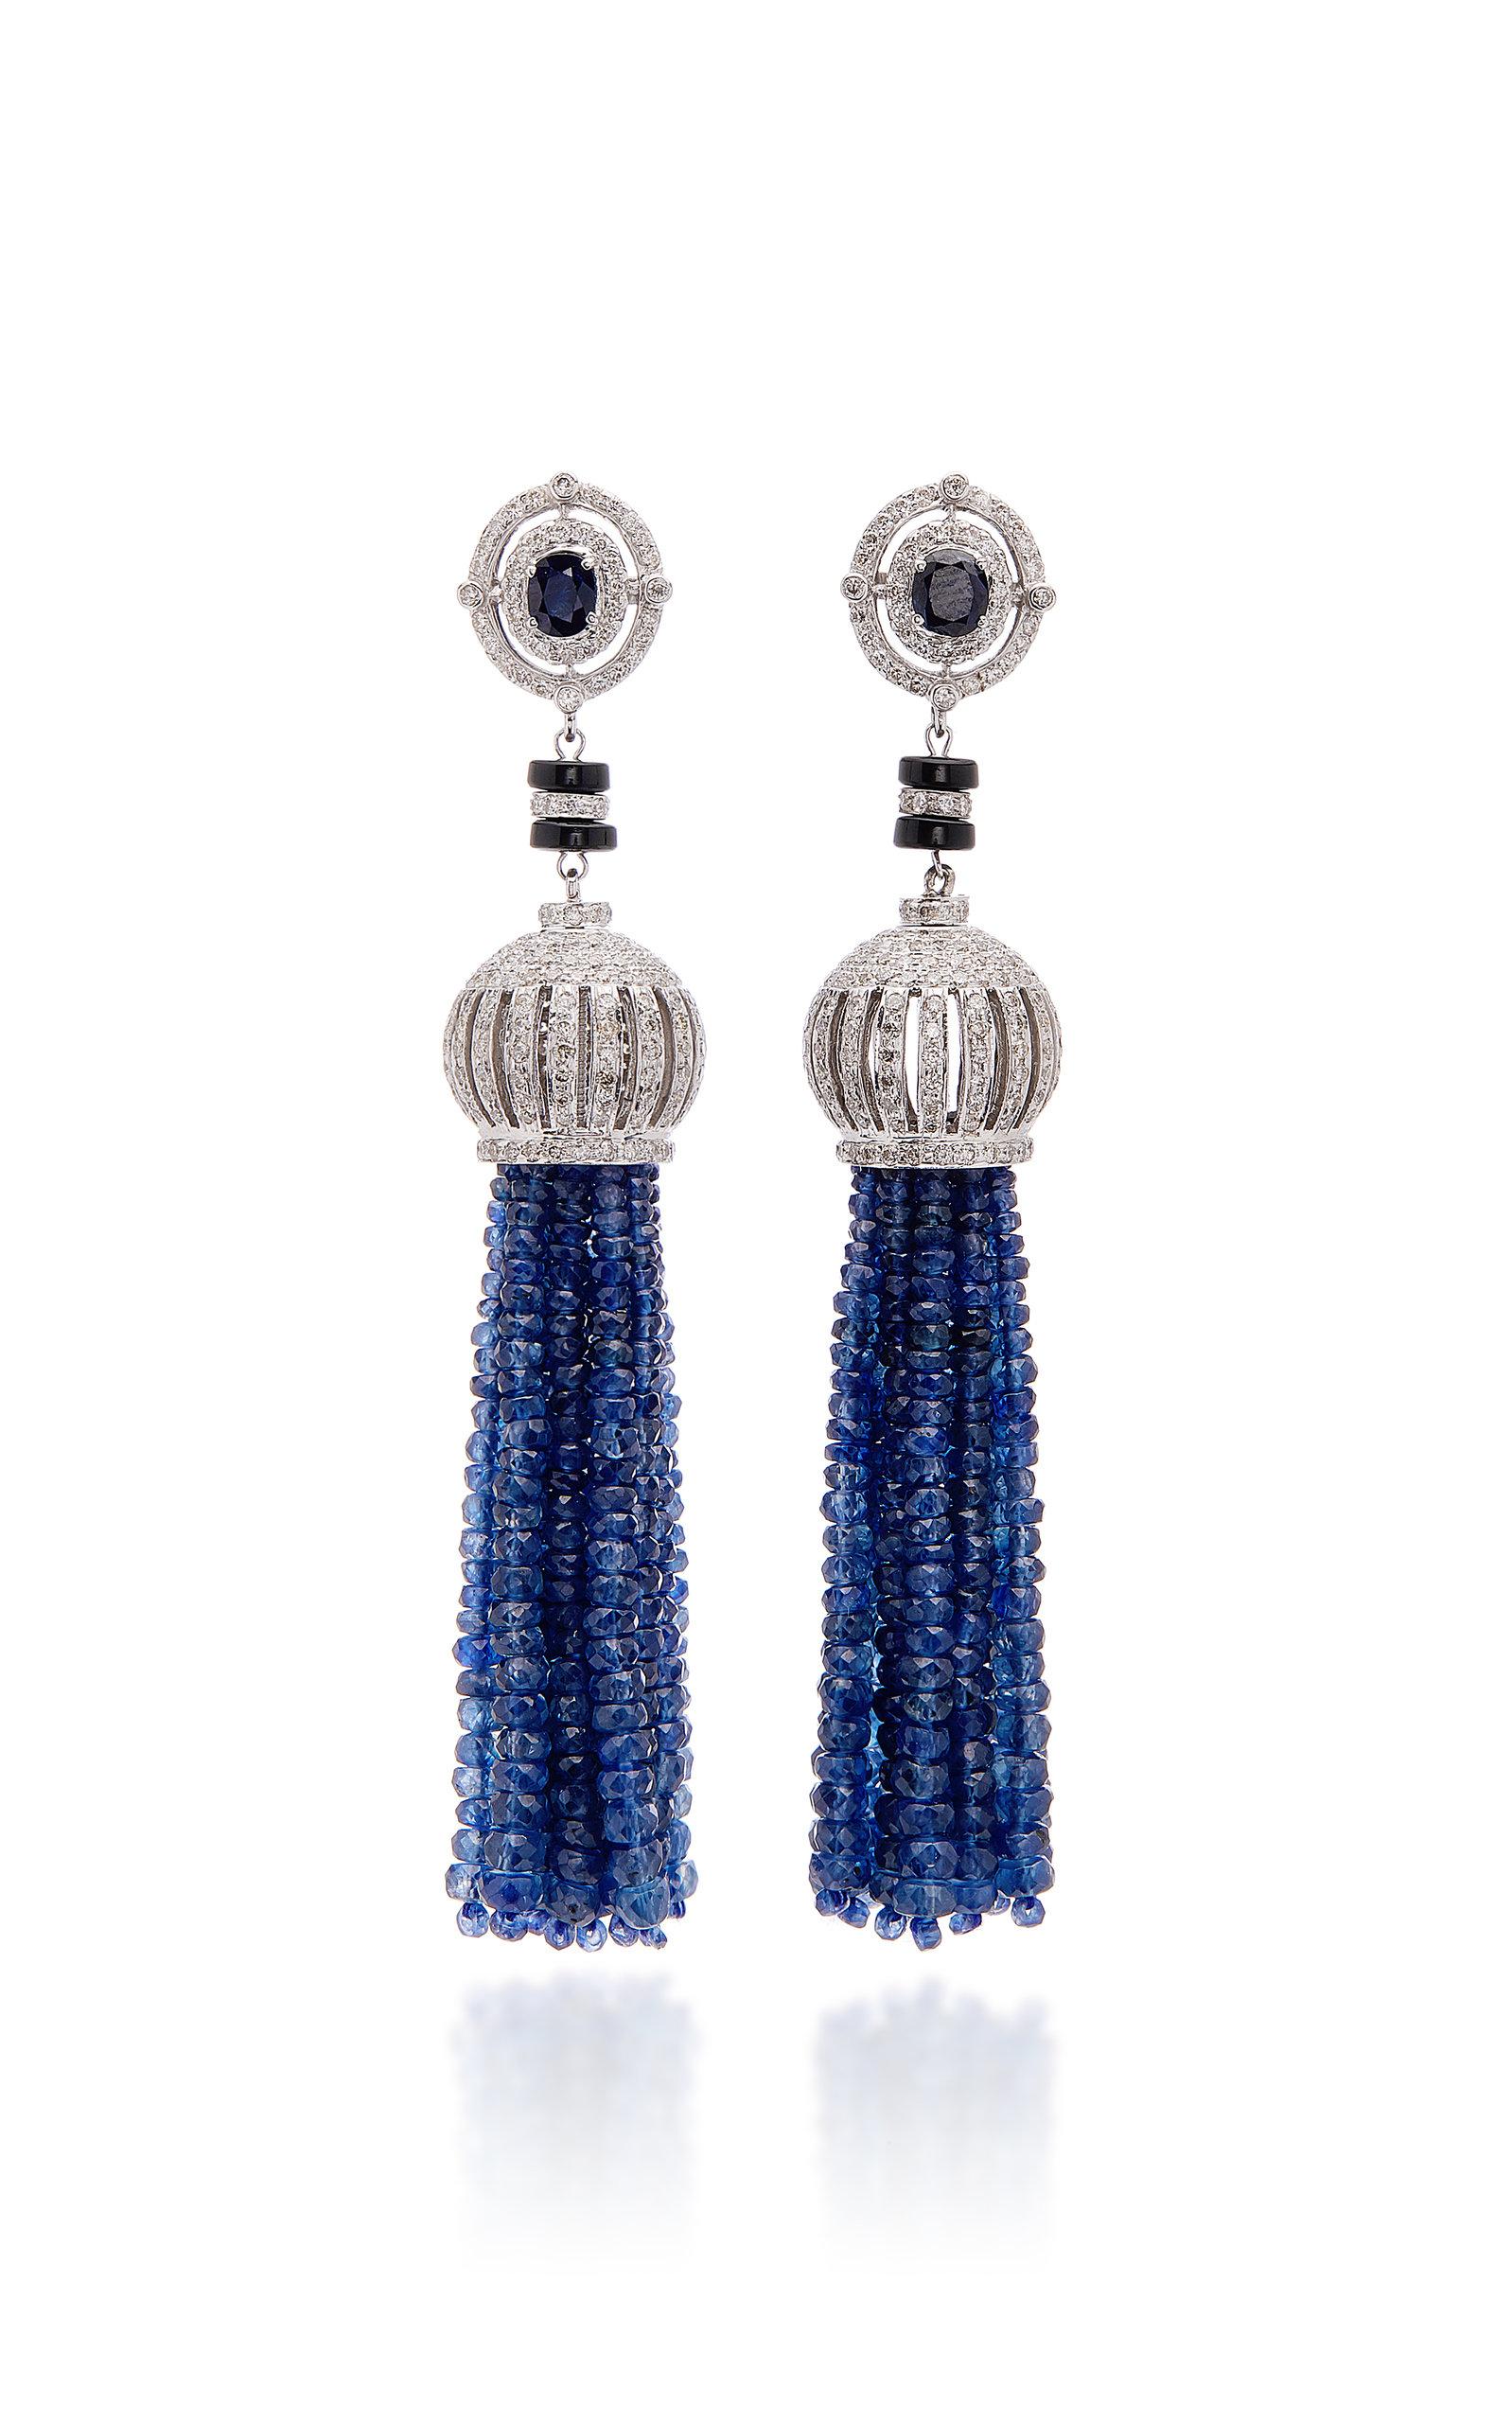 SANJAY KASLIWAL 18K White Gold Sapphire And Diamond Earrings in Blue